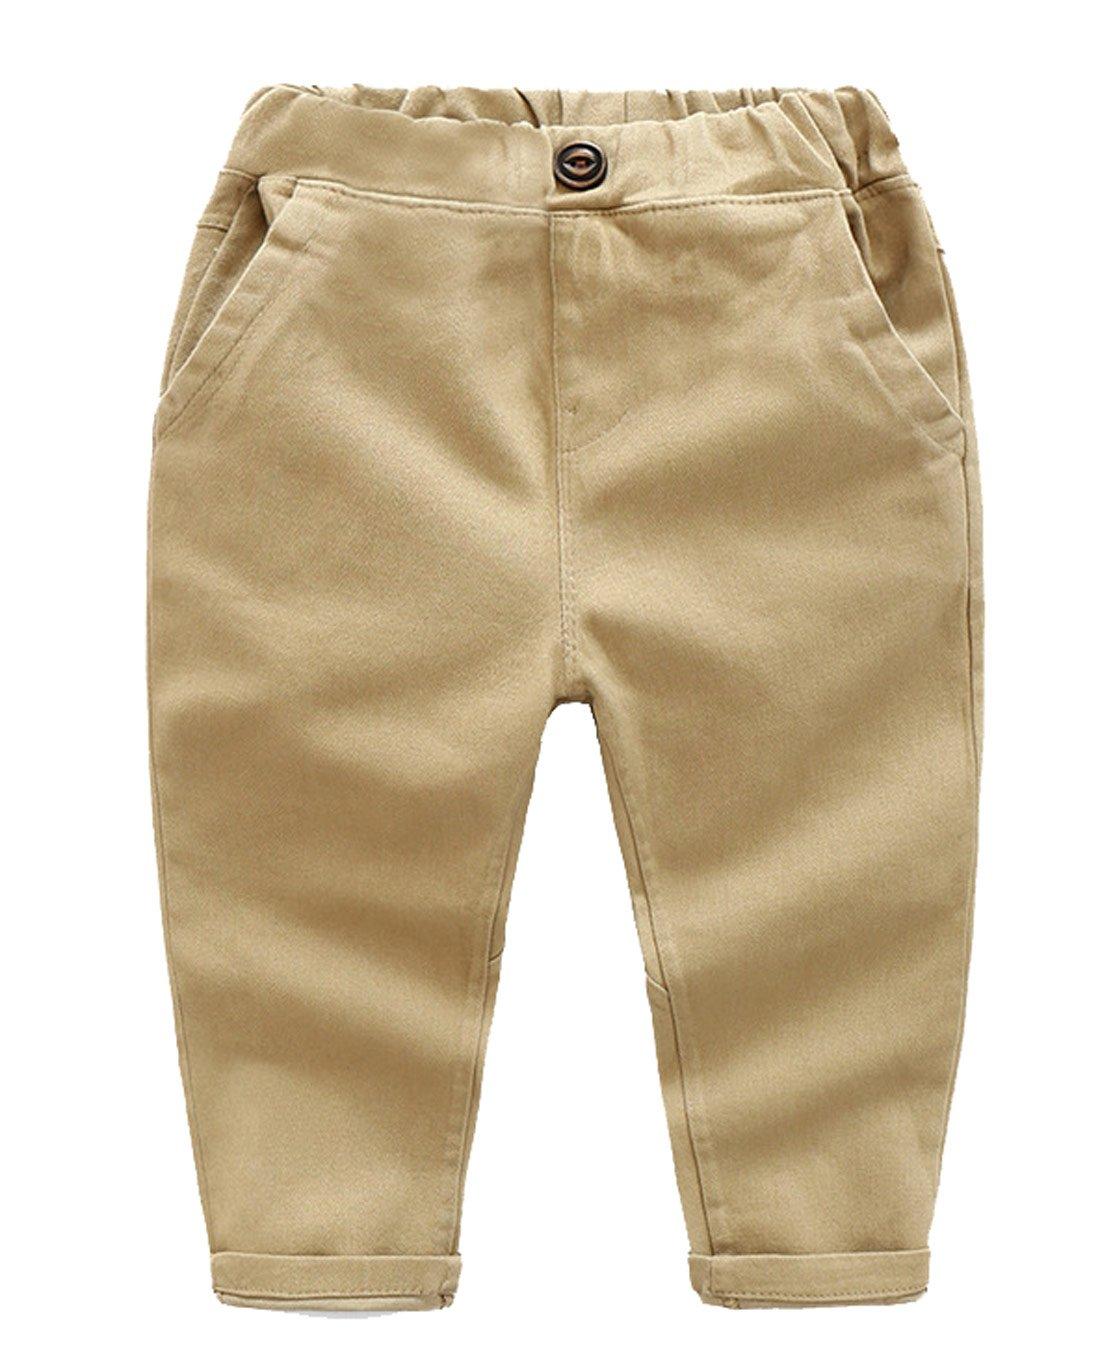 BALETONGNIAN Toddler Chino Pants Cotton Casual Jogger Pull On Pants Classic Long Pant Khaki 3T